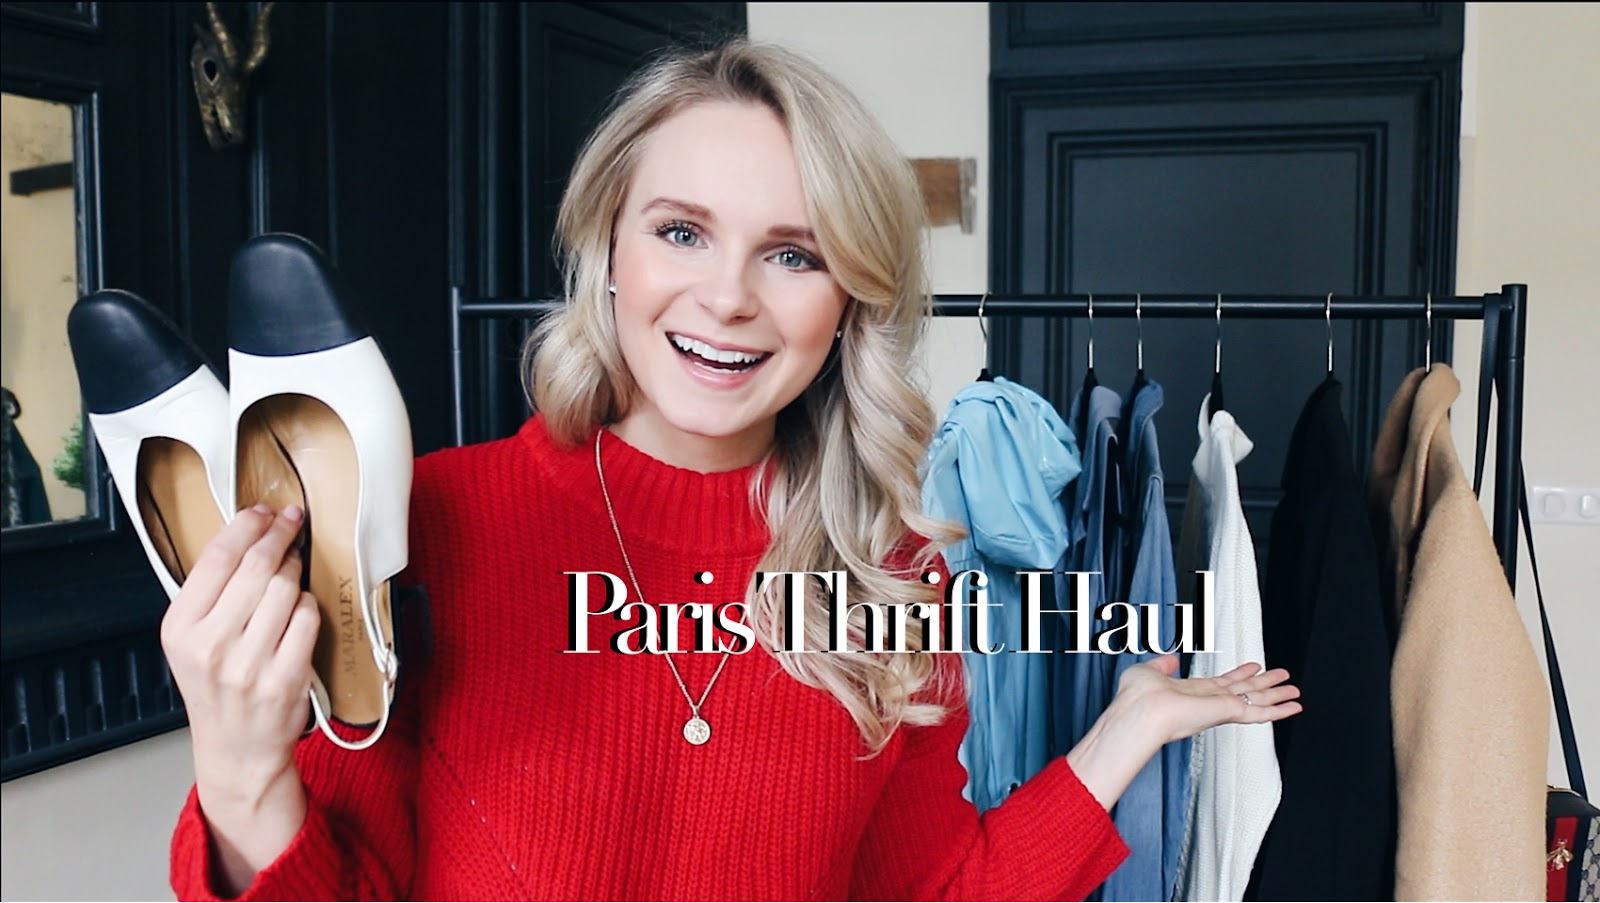 paris thrift haul video youtube